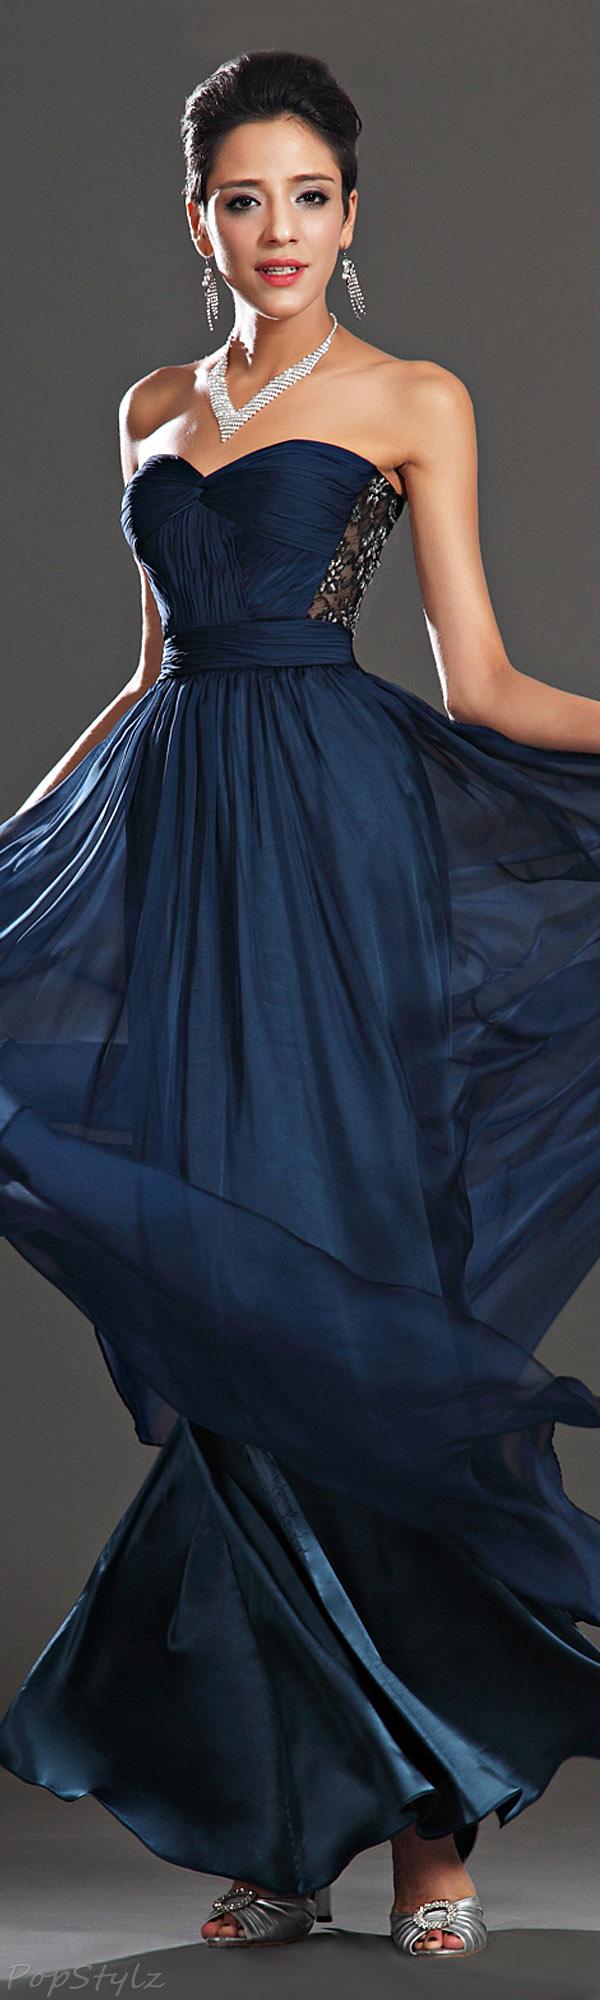 eDressit 00135705 Evening Gown